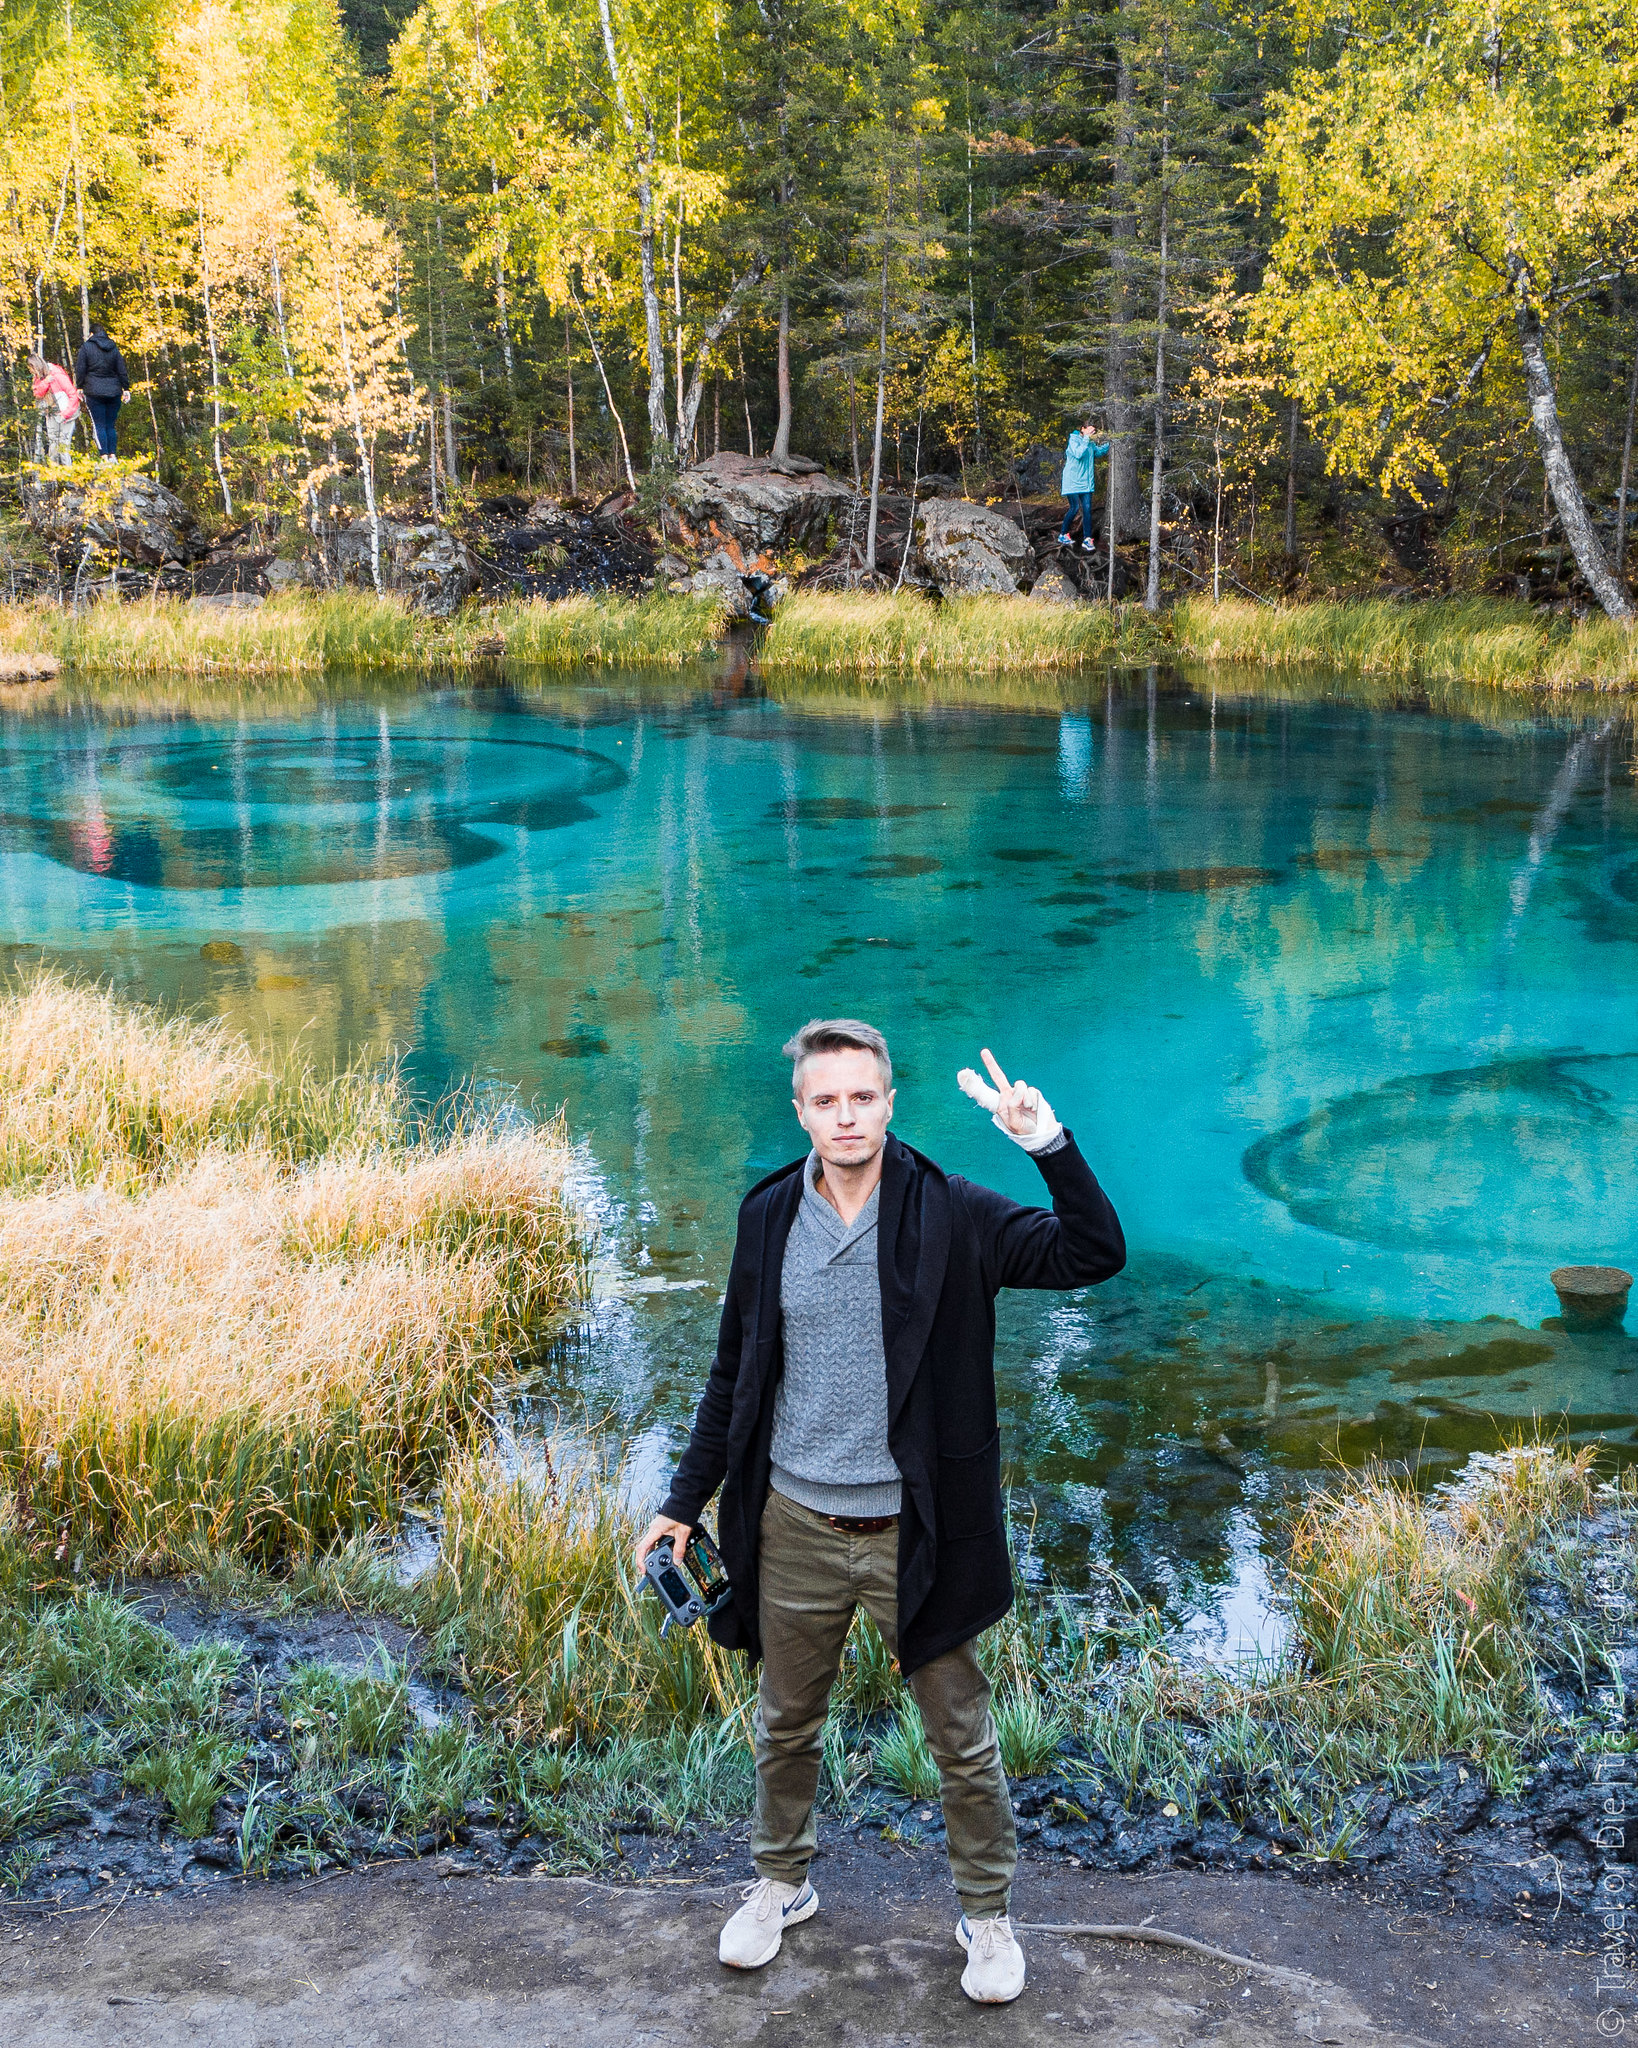 гейзерное-озеро-алтай-осень-gayser-lake-autumn-mavic--0465